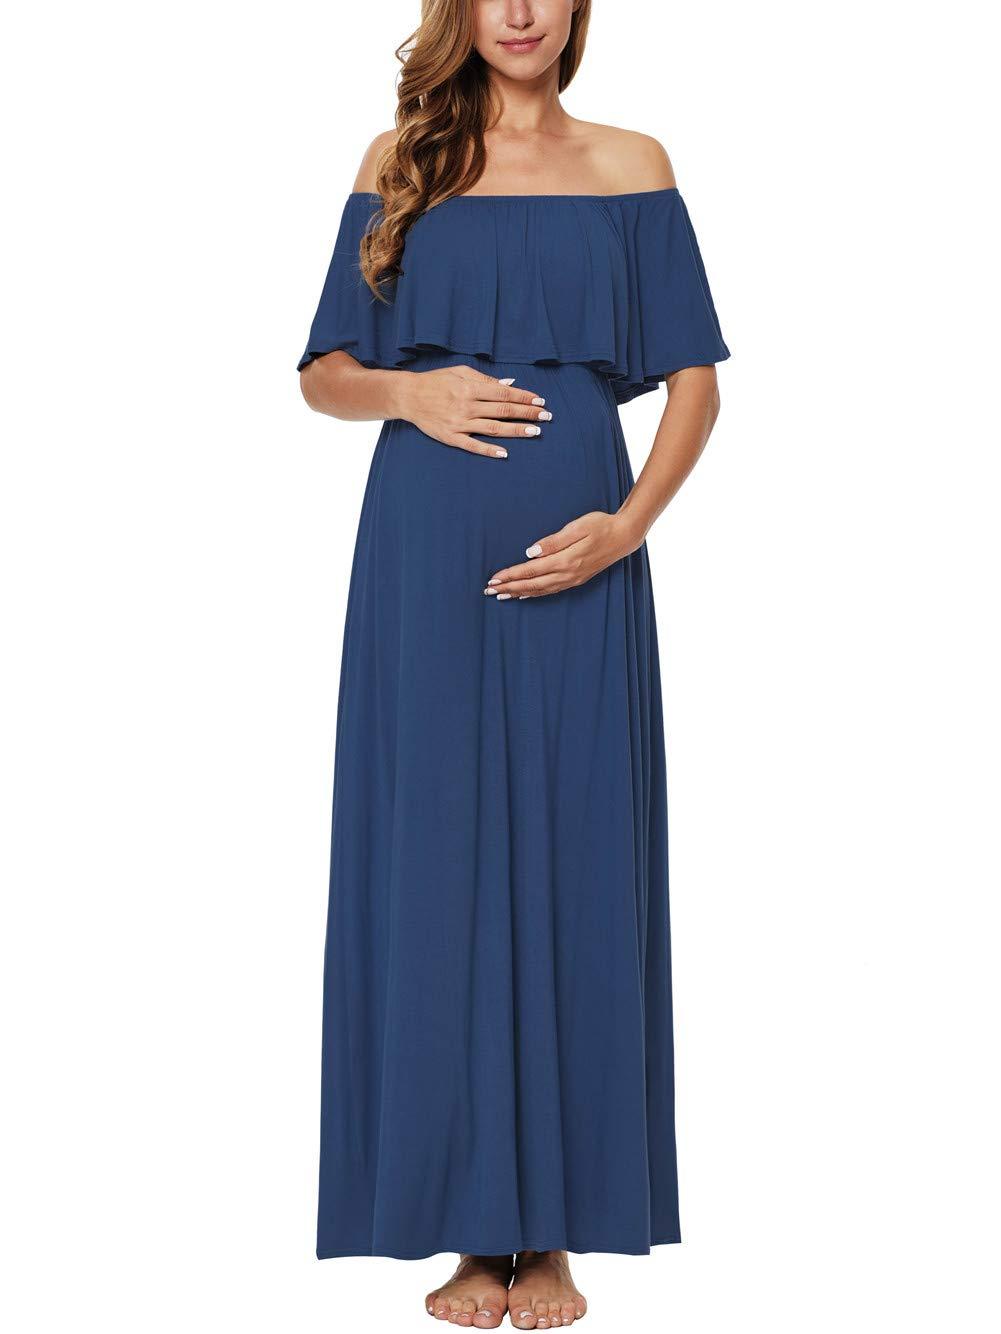 Caregabi Women's Ruffle Off The Shoulder Maxi Maternity Dress (Navy, M)